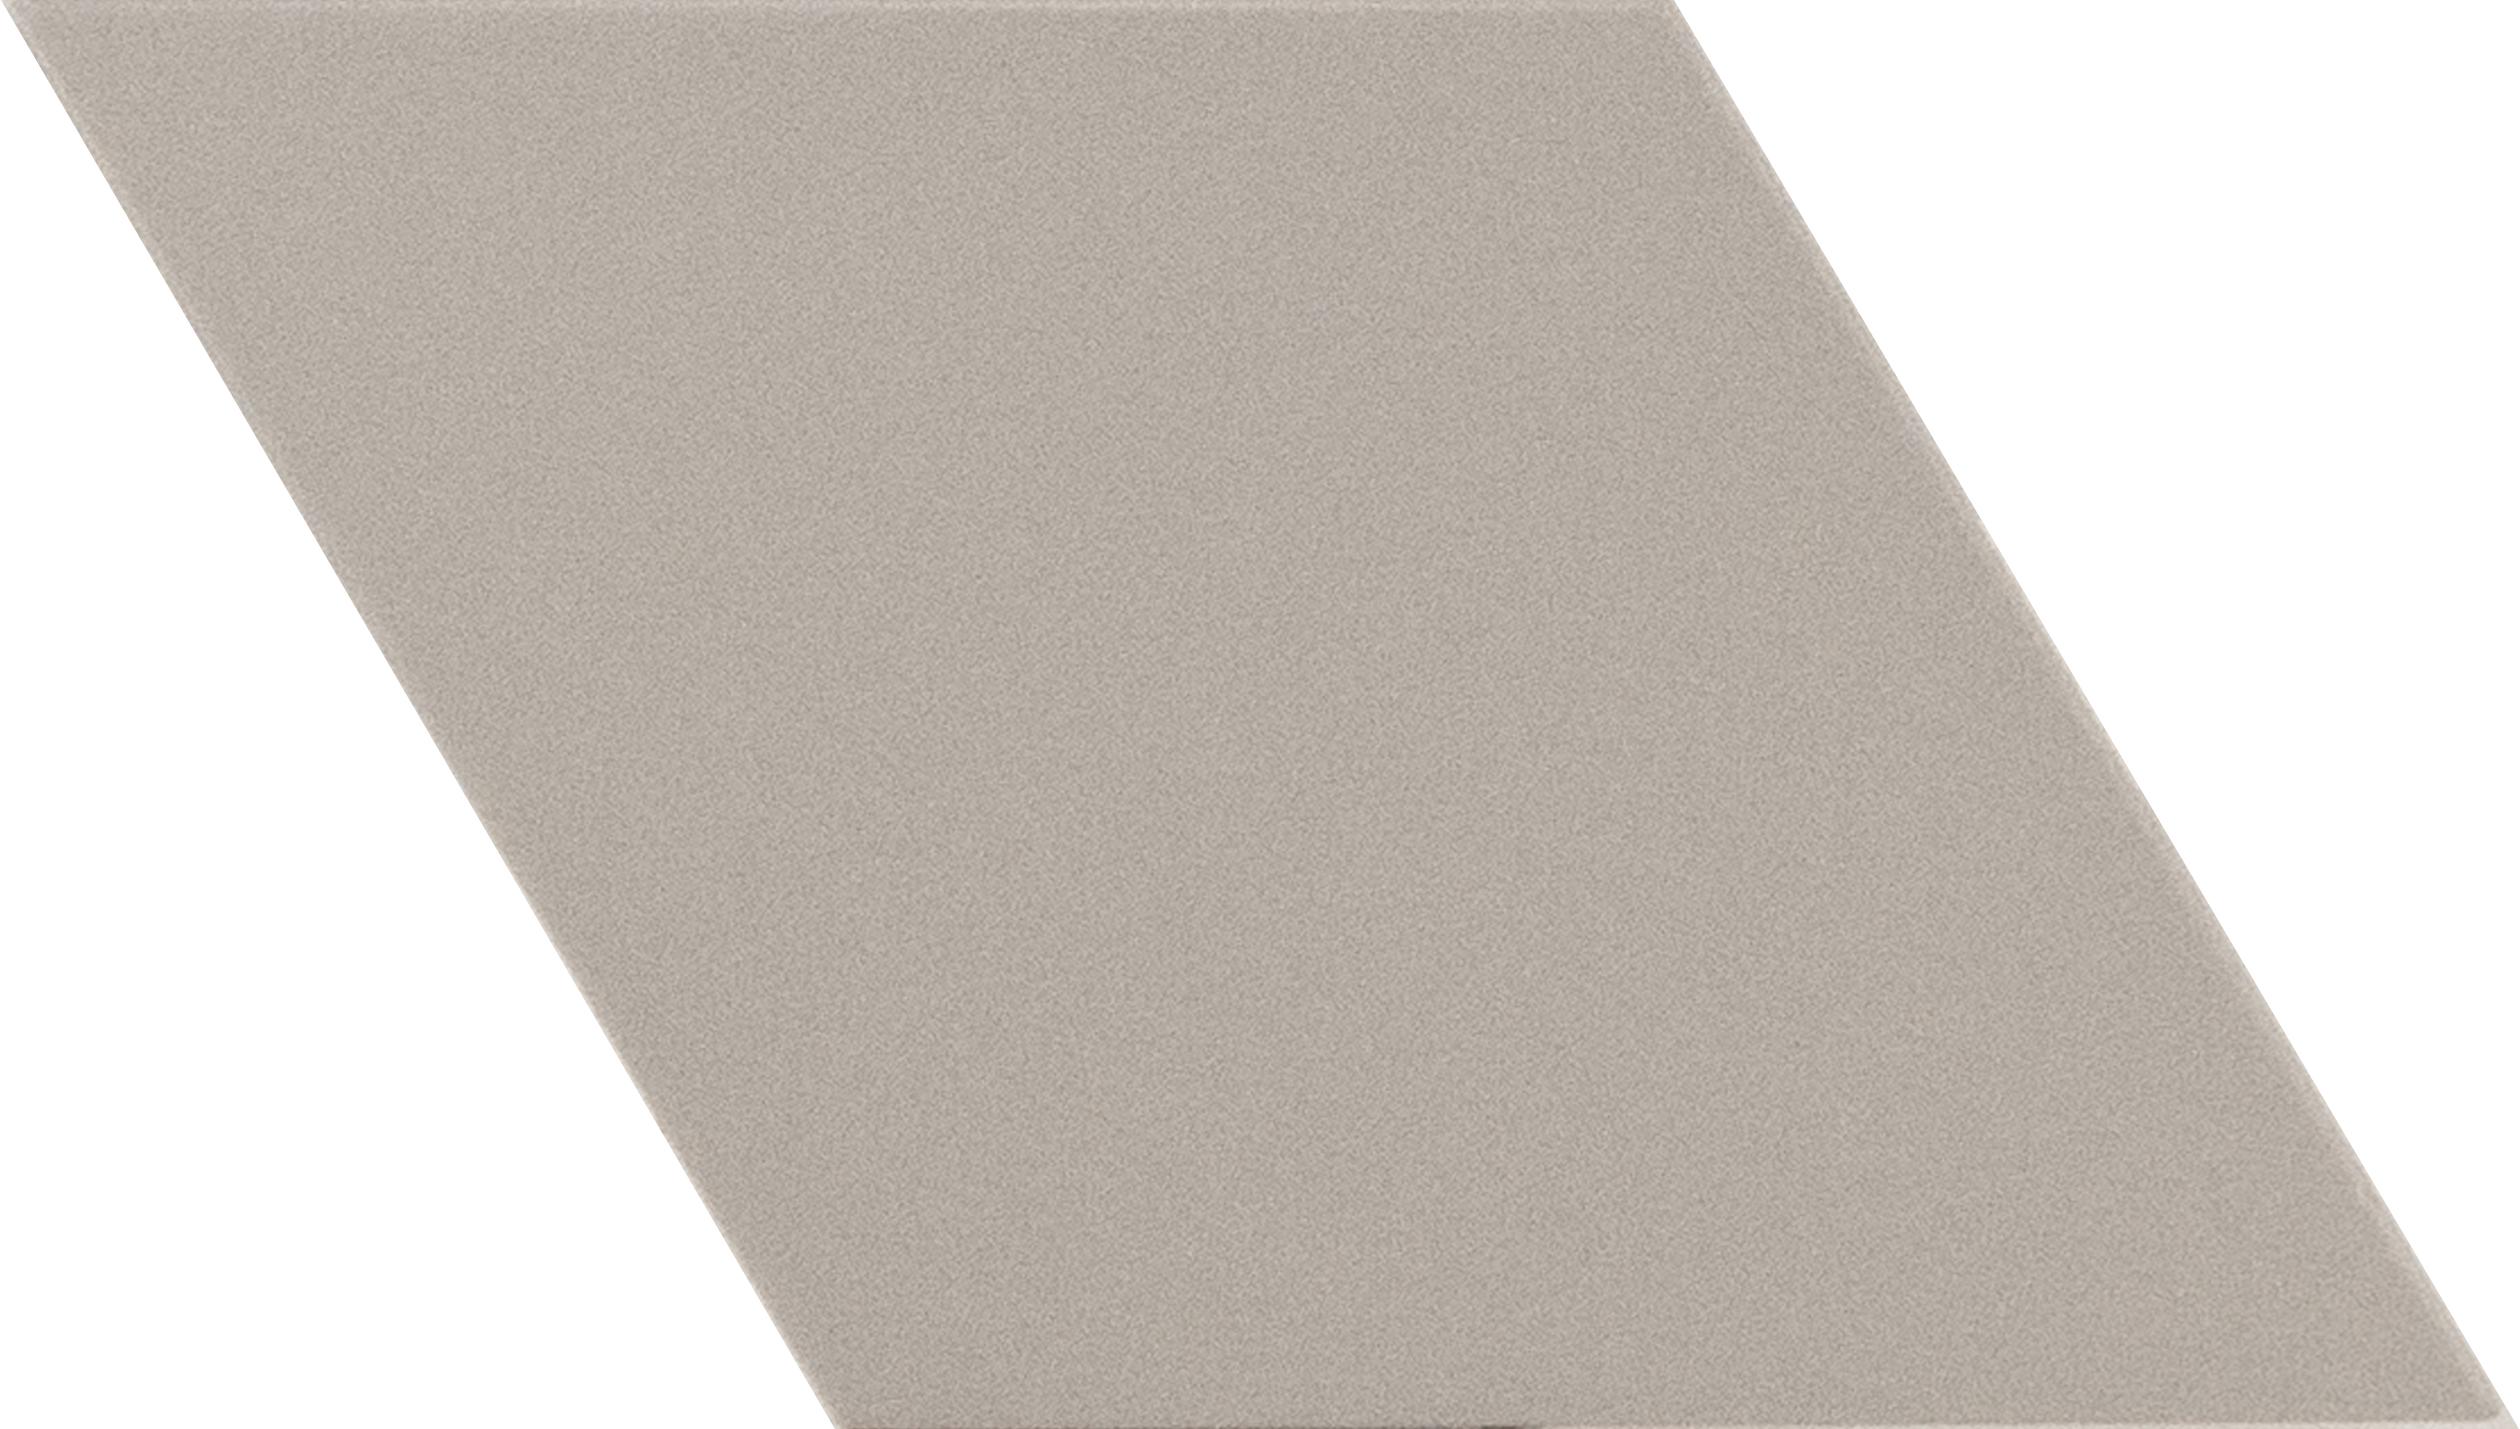 Sample Bathroom Designs Rhombus Light Grey Smooth Matt Ceramic Tile Supplies